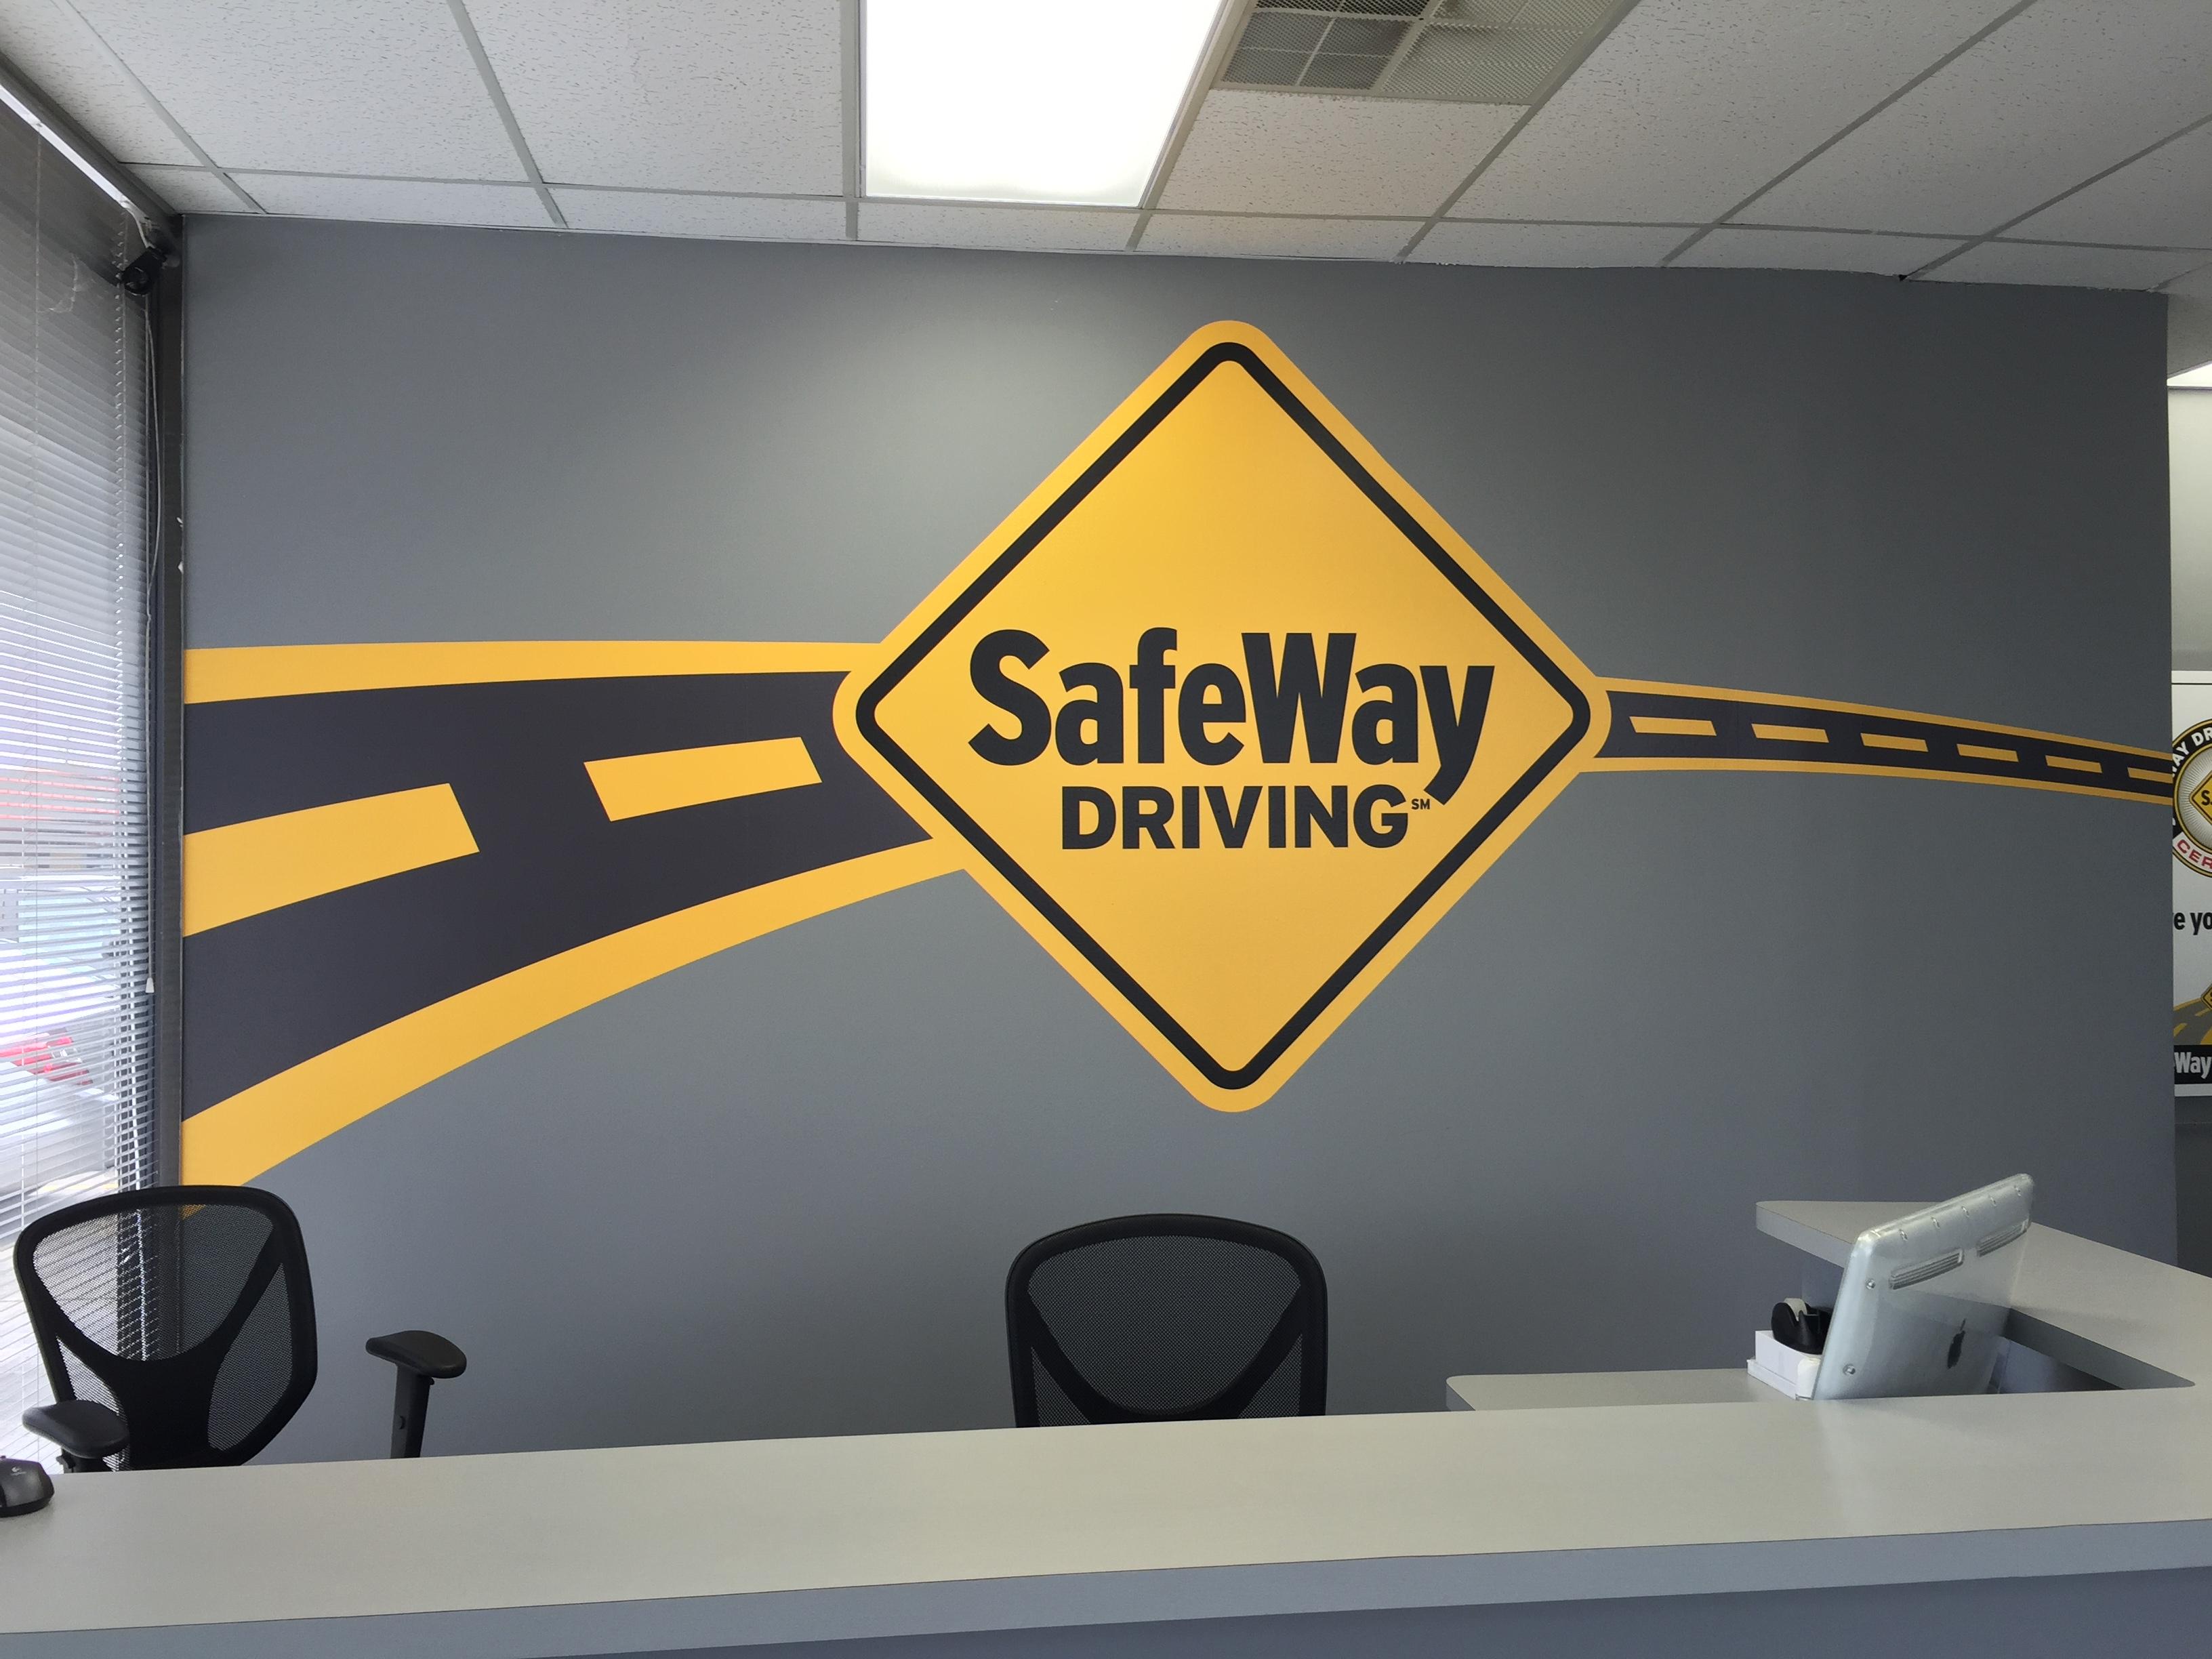 Safeway Driving Katy 6193 Katy Fwy 211 Katy Tx 77494